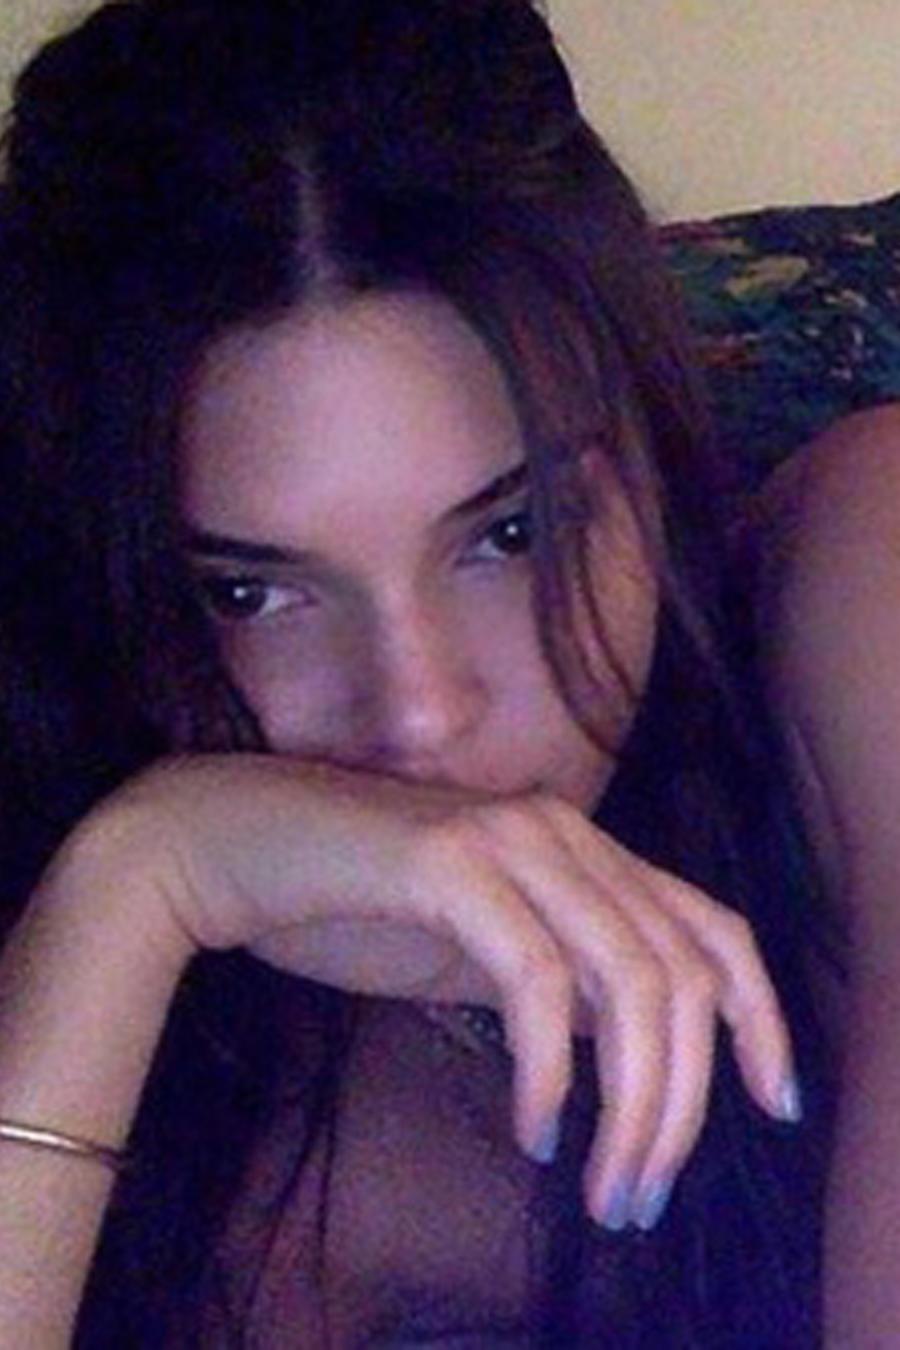 Kendall Jenner acostada en la cama